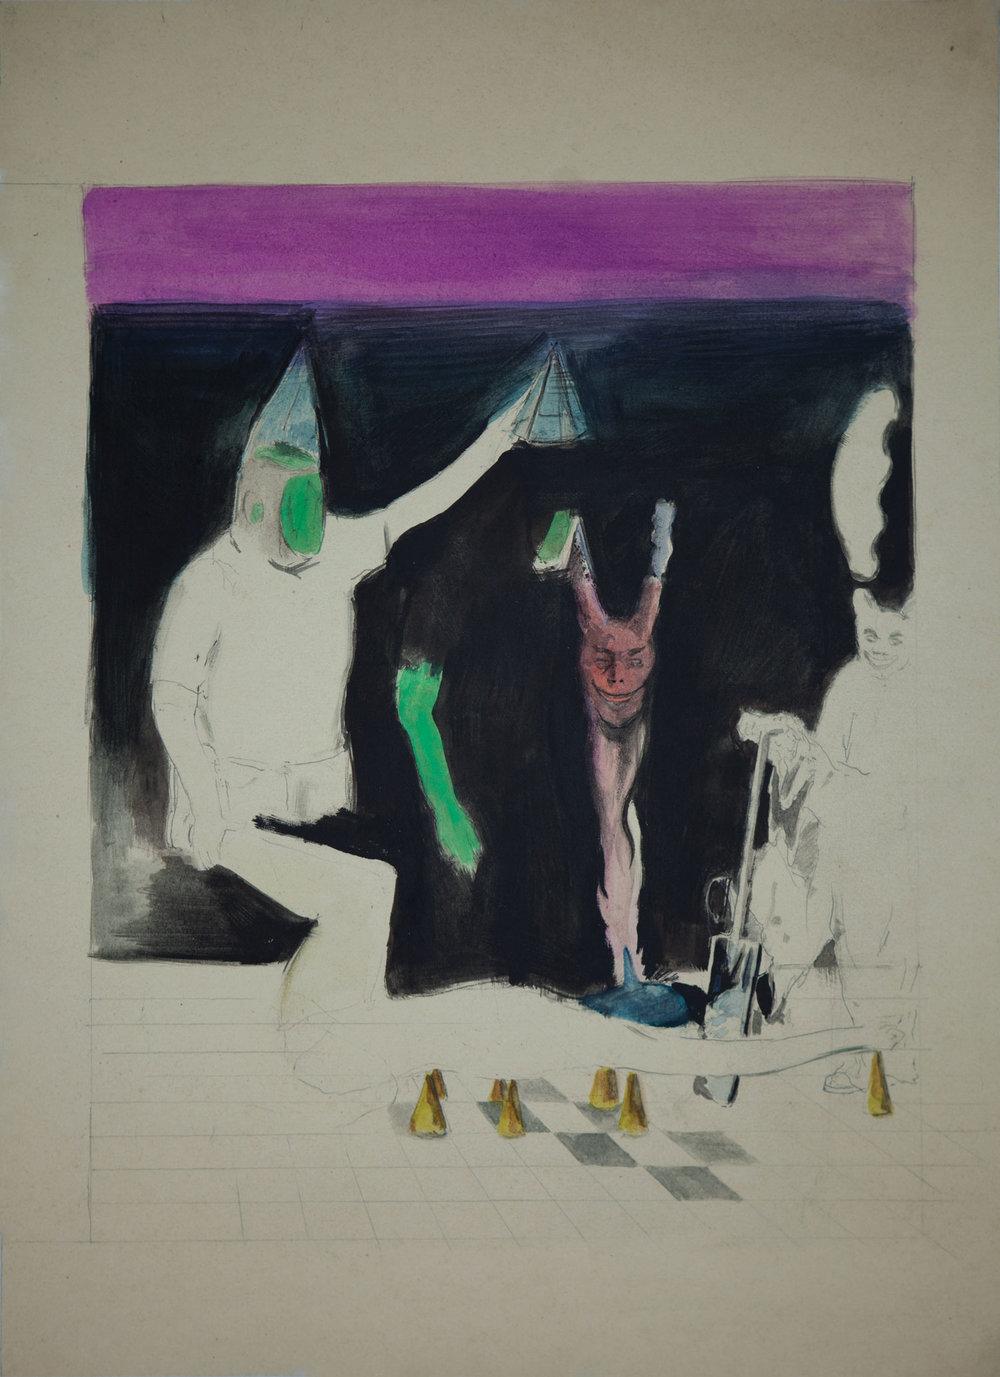 MIKOŁAJ MAŁEK  O.T., 2018 Gouache on paper, 45,7 x 33,3 cm